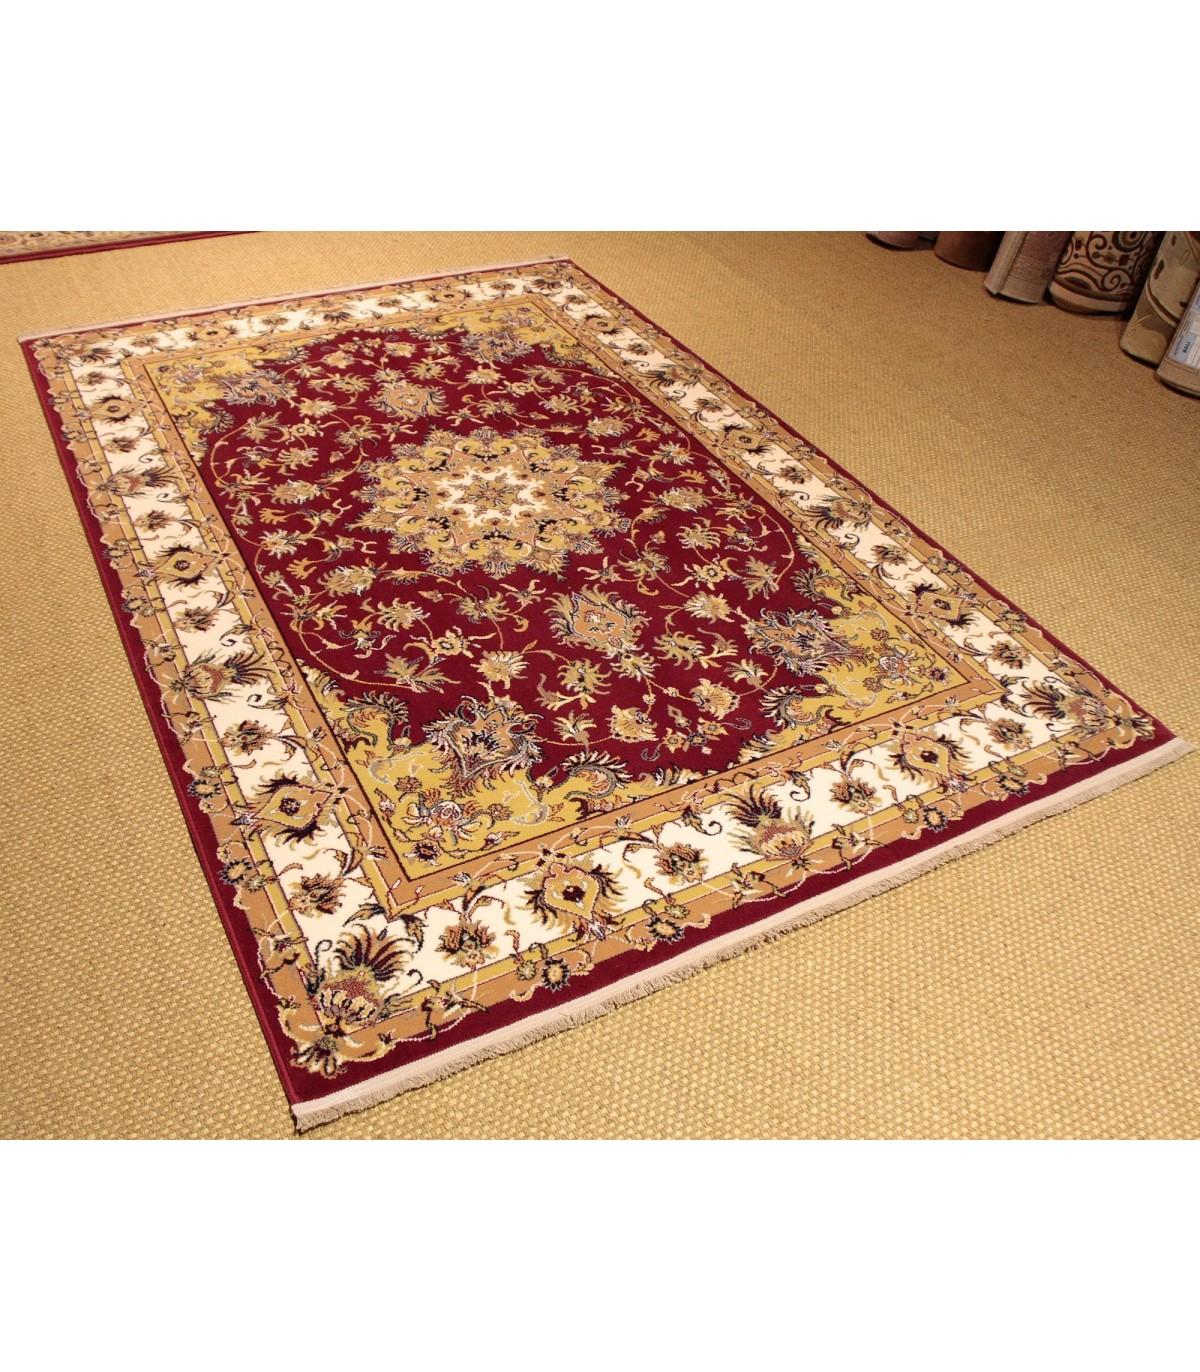 Alfombra Persia 872 clásica de pura lana 100% fabricada en